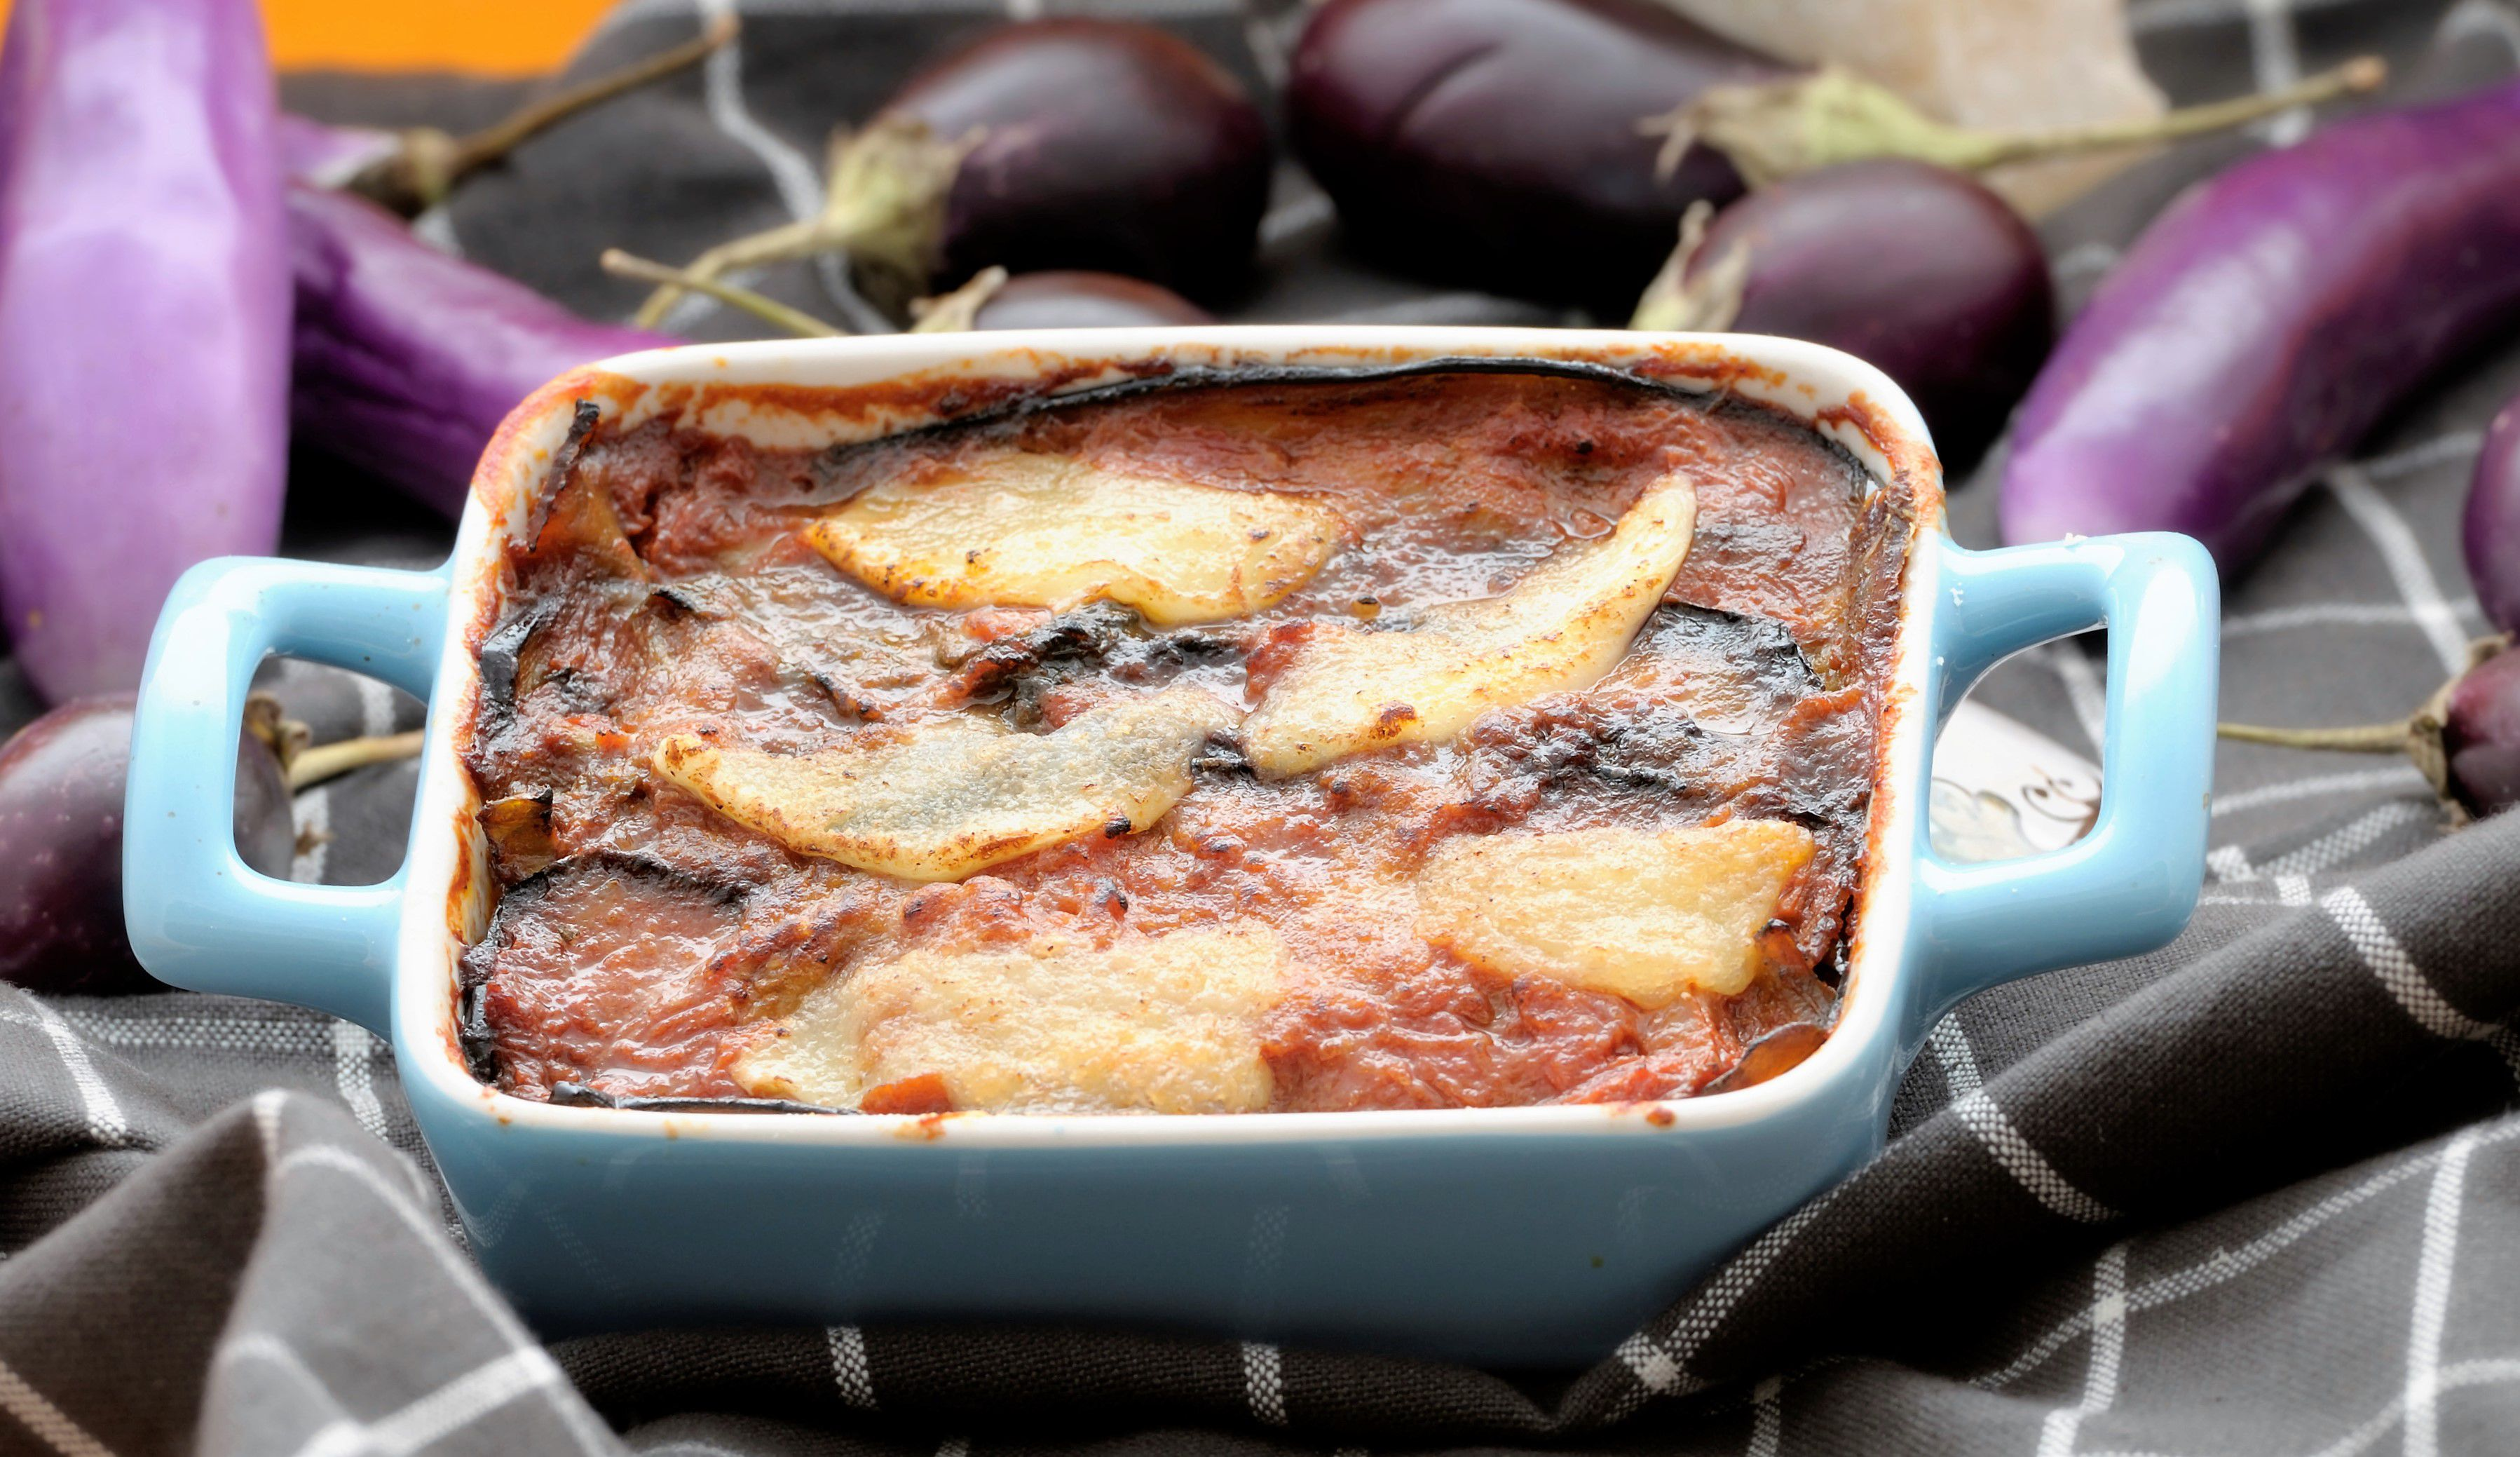 Eggplant Parmesan (Parmigiana di melanzane)